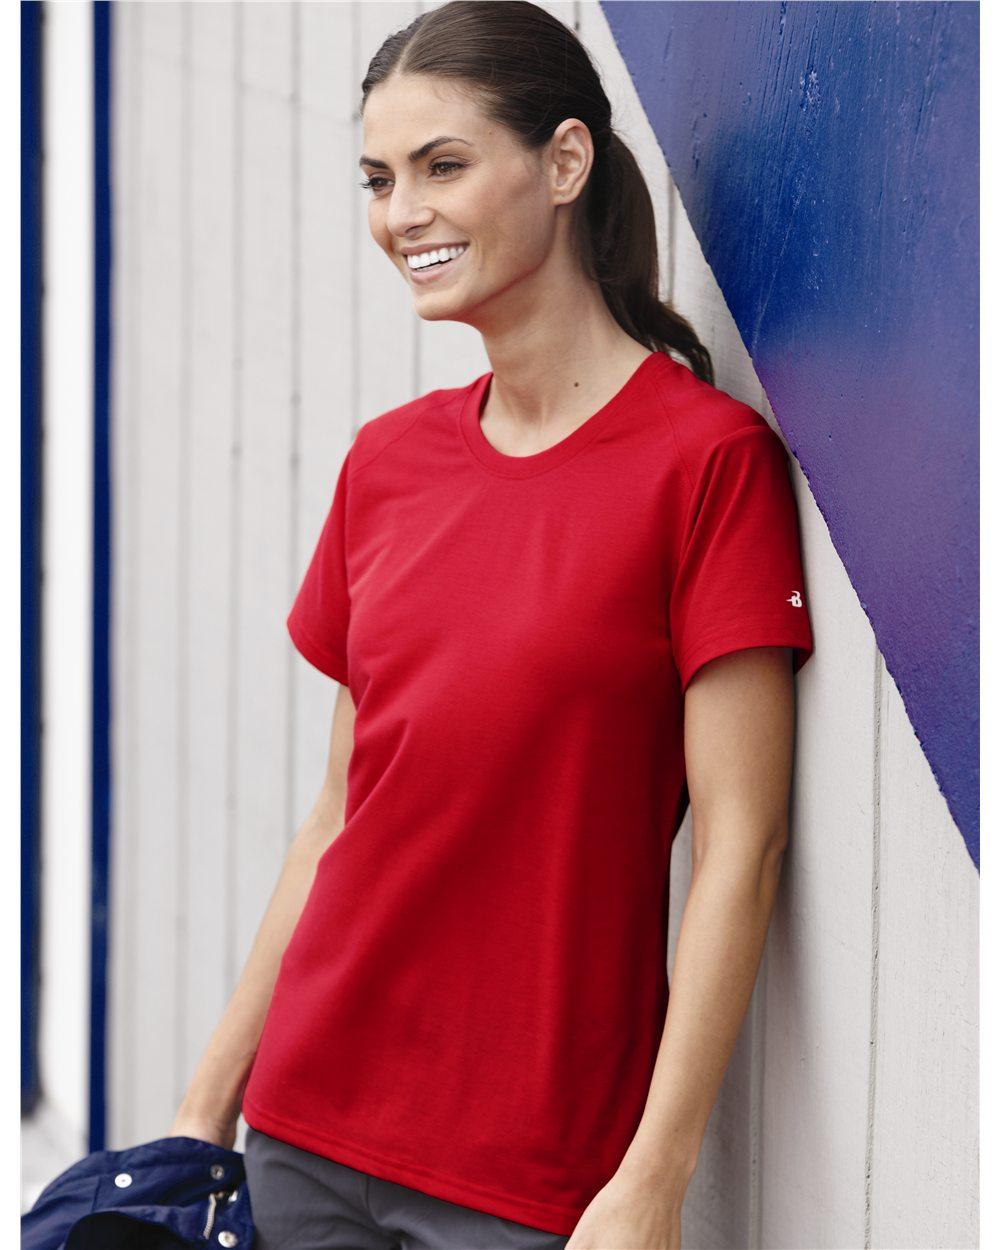 Badger 4860 - Ladies' B-Tech Cotton-Feel Short Sleeve T-Shirt